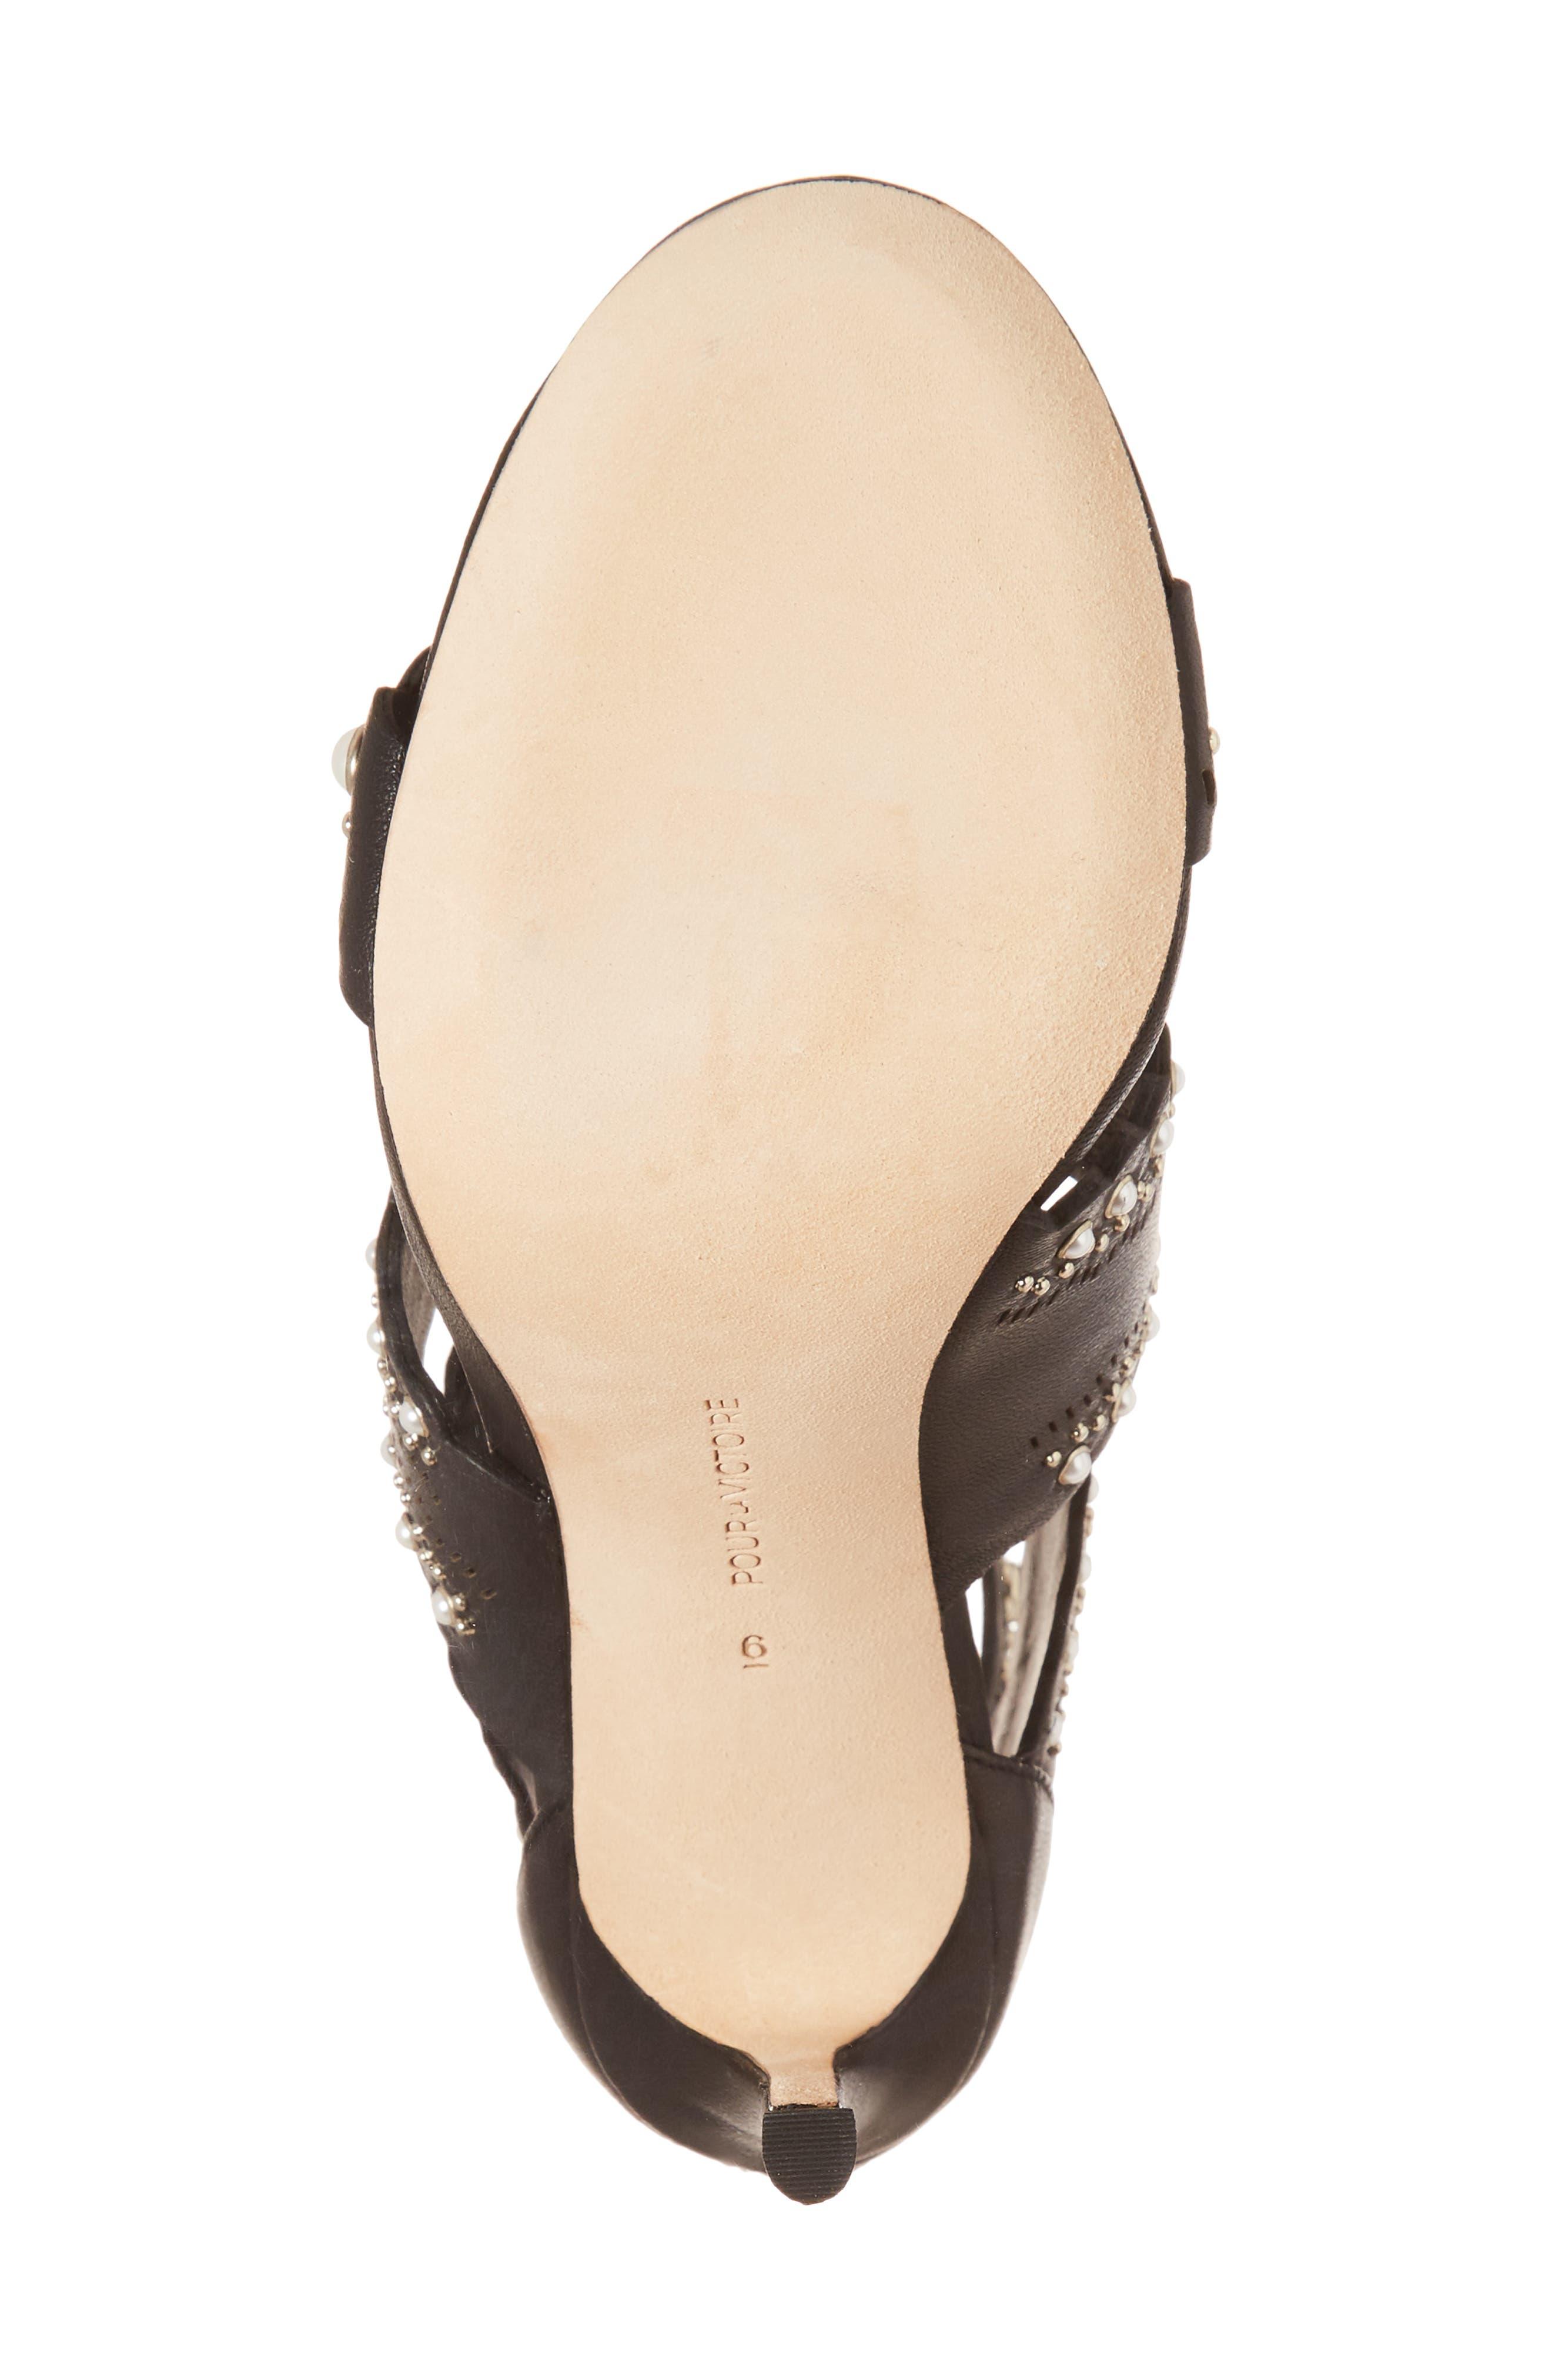 Ellura Scalloped Strap Sandal,                             Alternate thumbnail 6, color,                             Black Leather